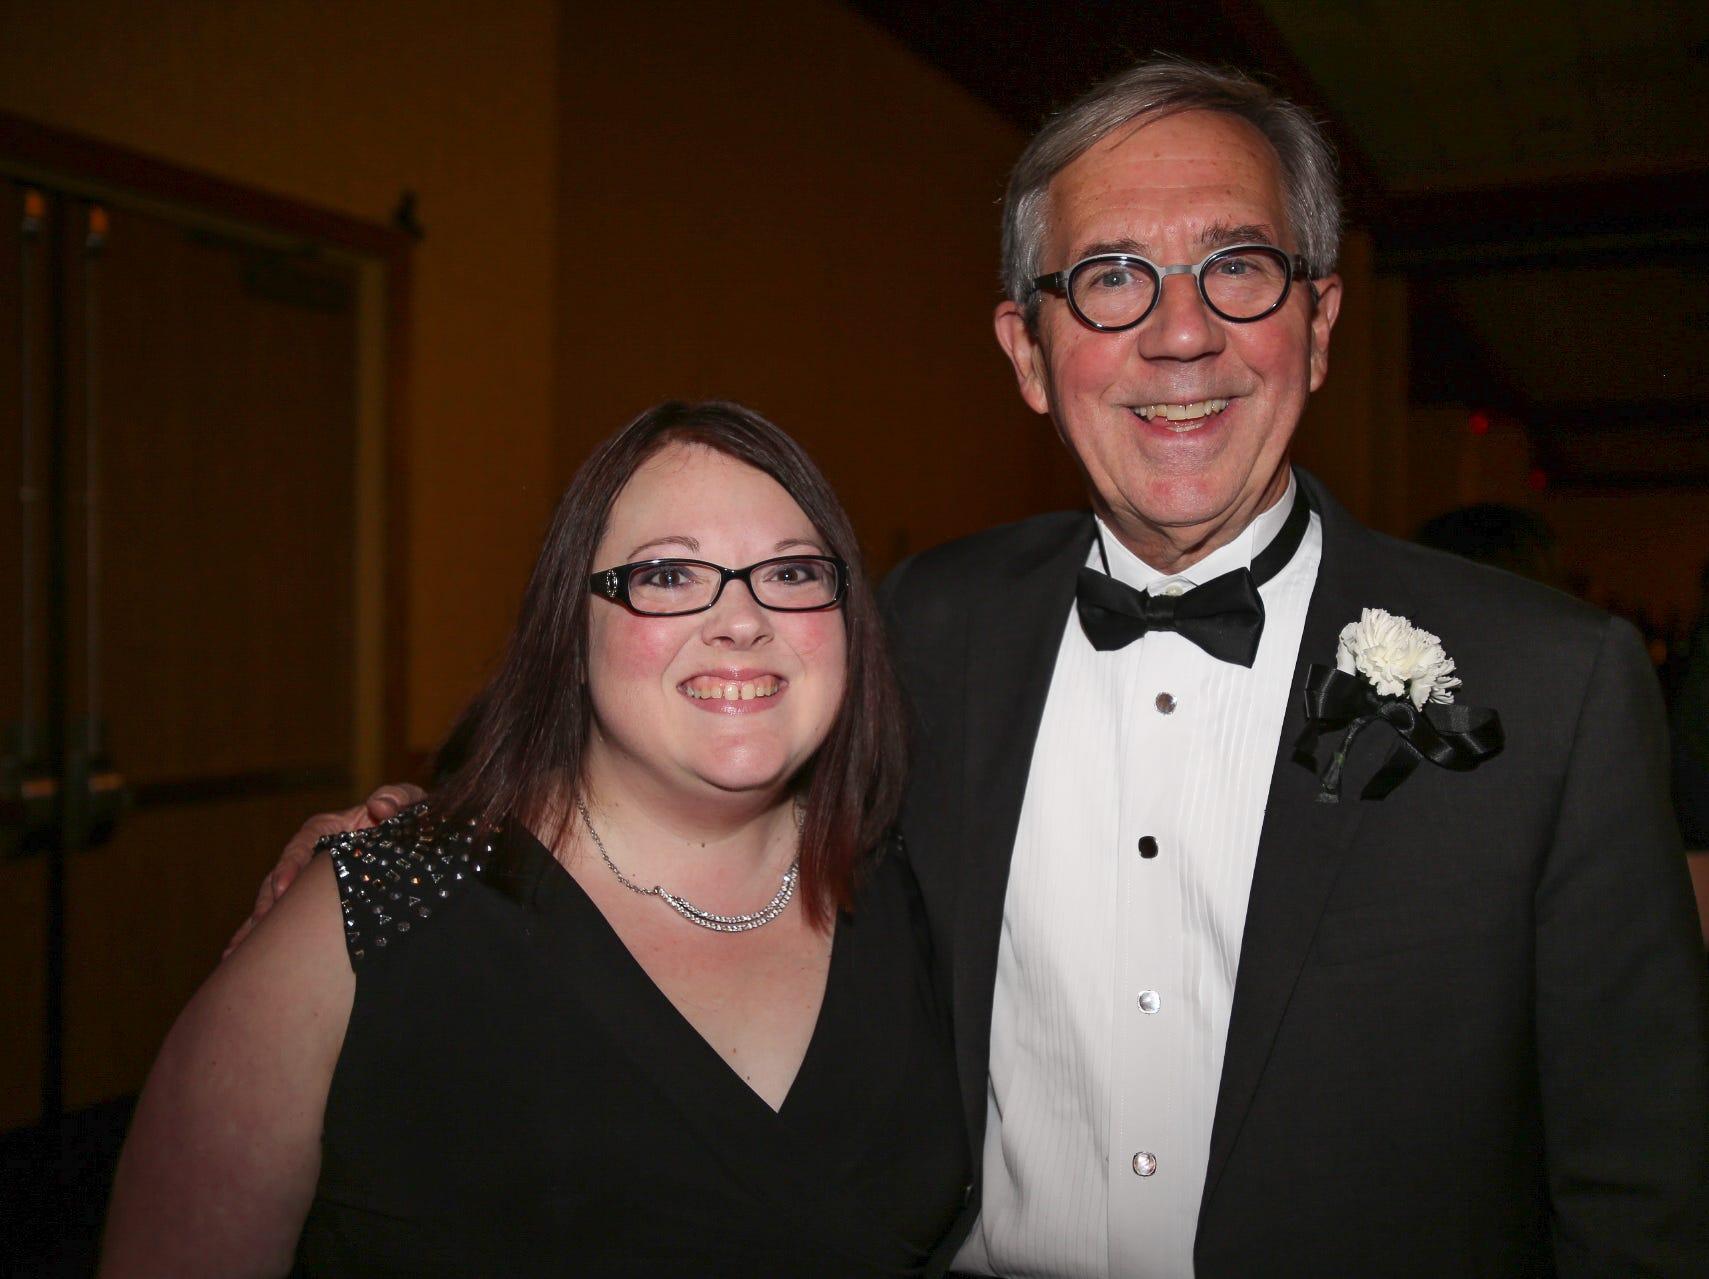 Becky Hopkins and Jeff Munzinger